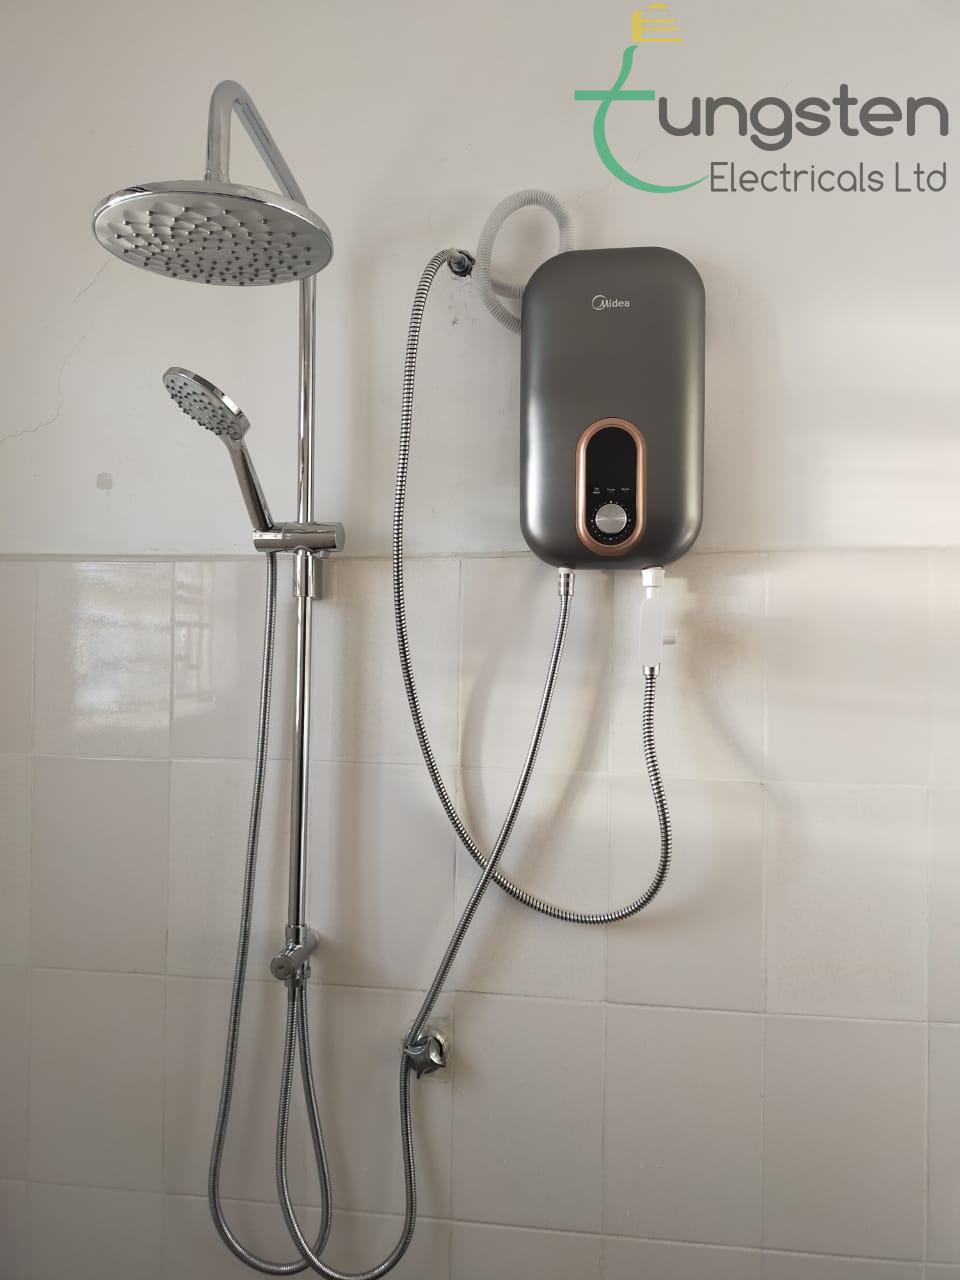 Midea|Tankless heater|Rainshower|D.C Pump|Installation